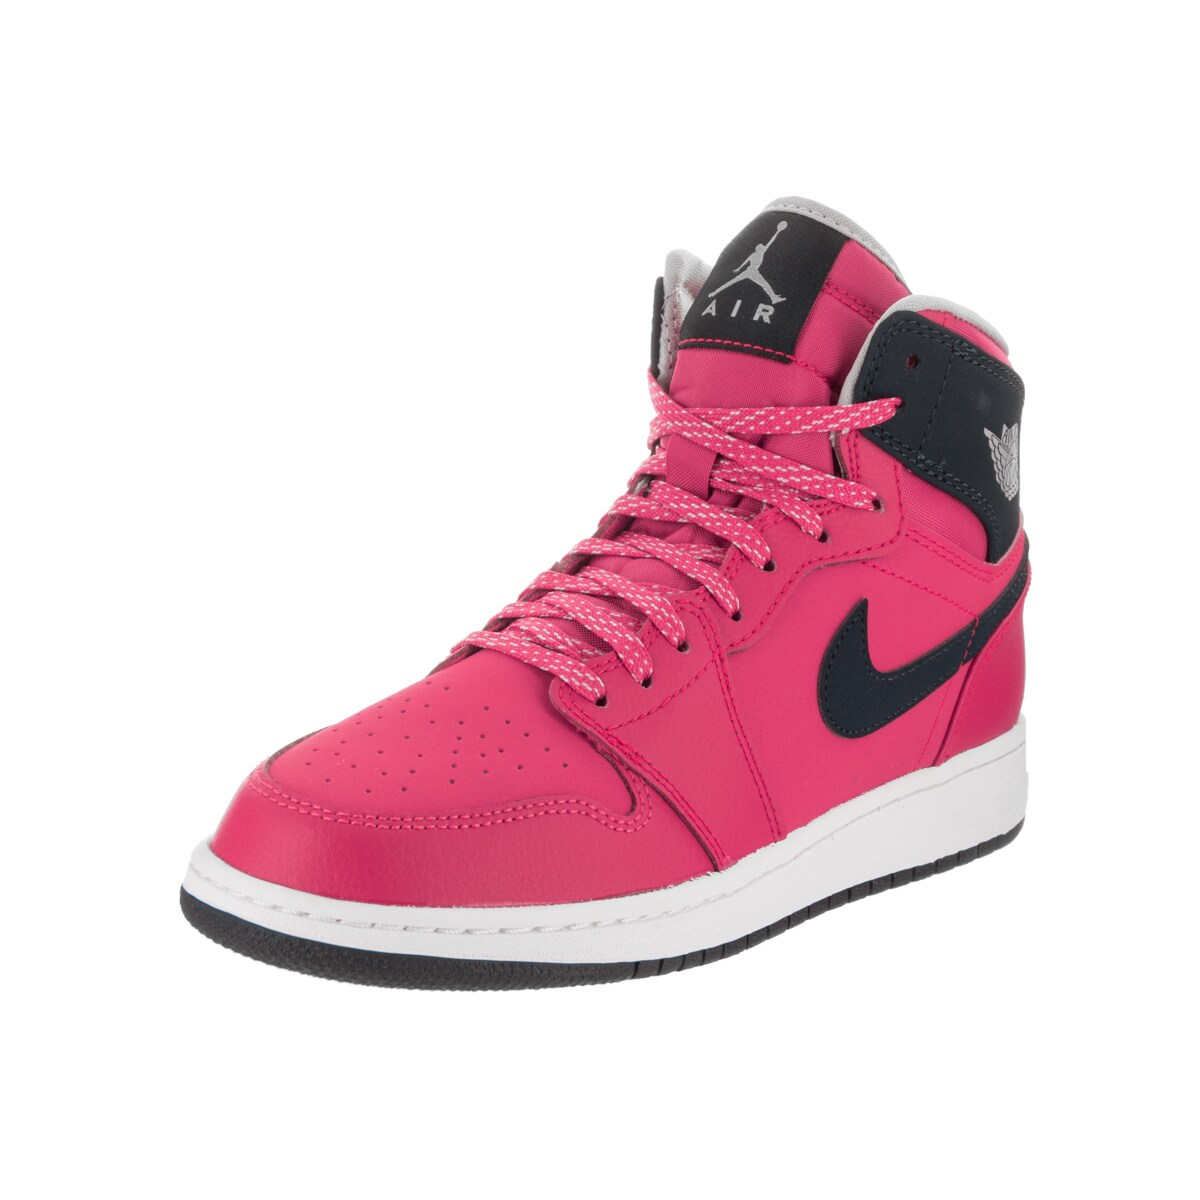 Nike Jordan Kids Air Jordan 1 Retro High GG Basketball Sh...